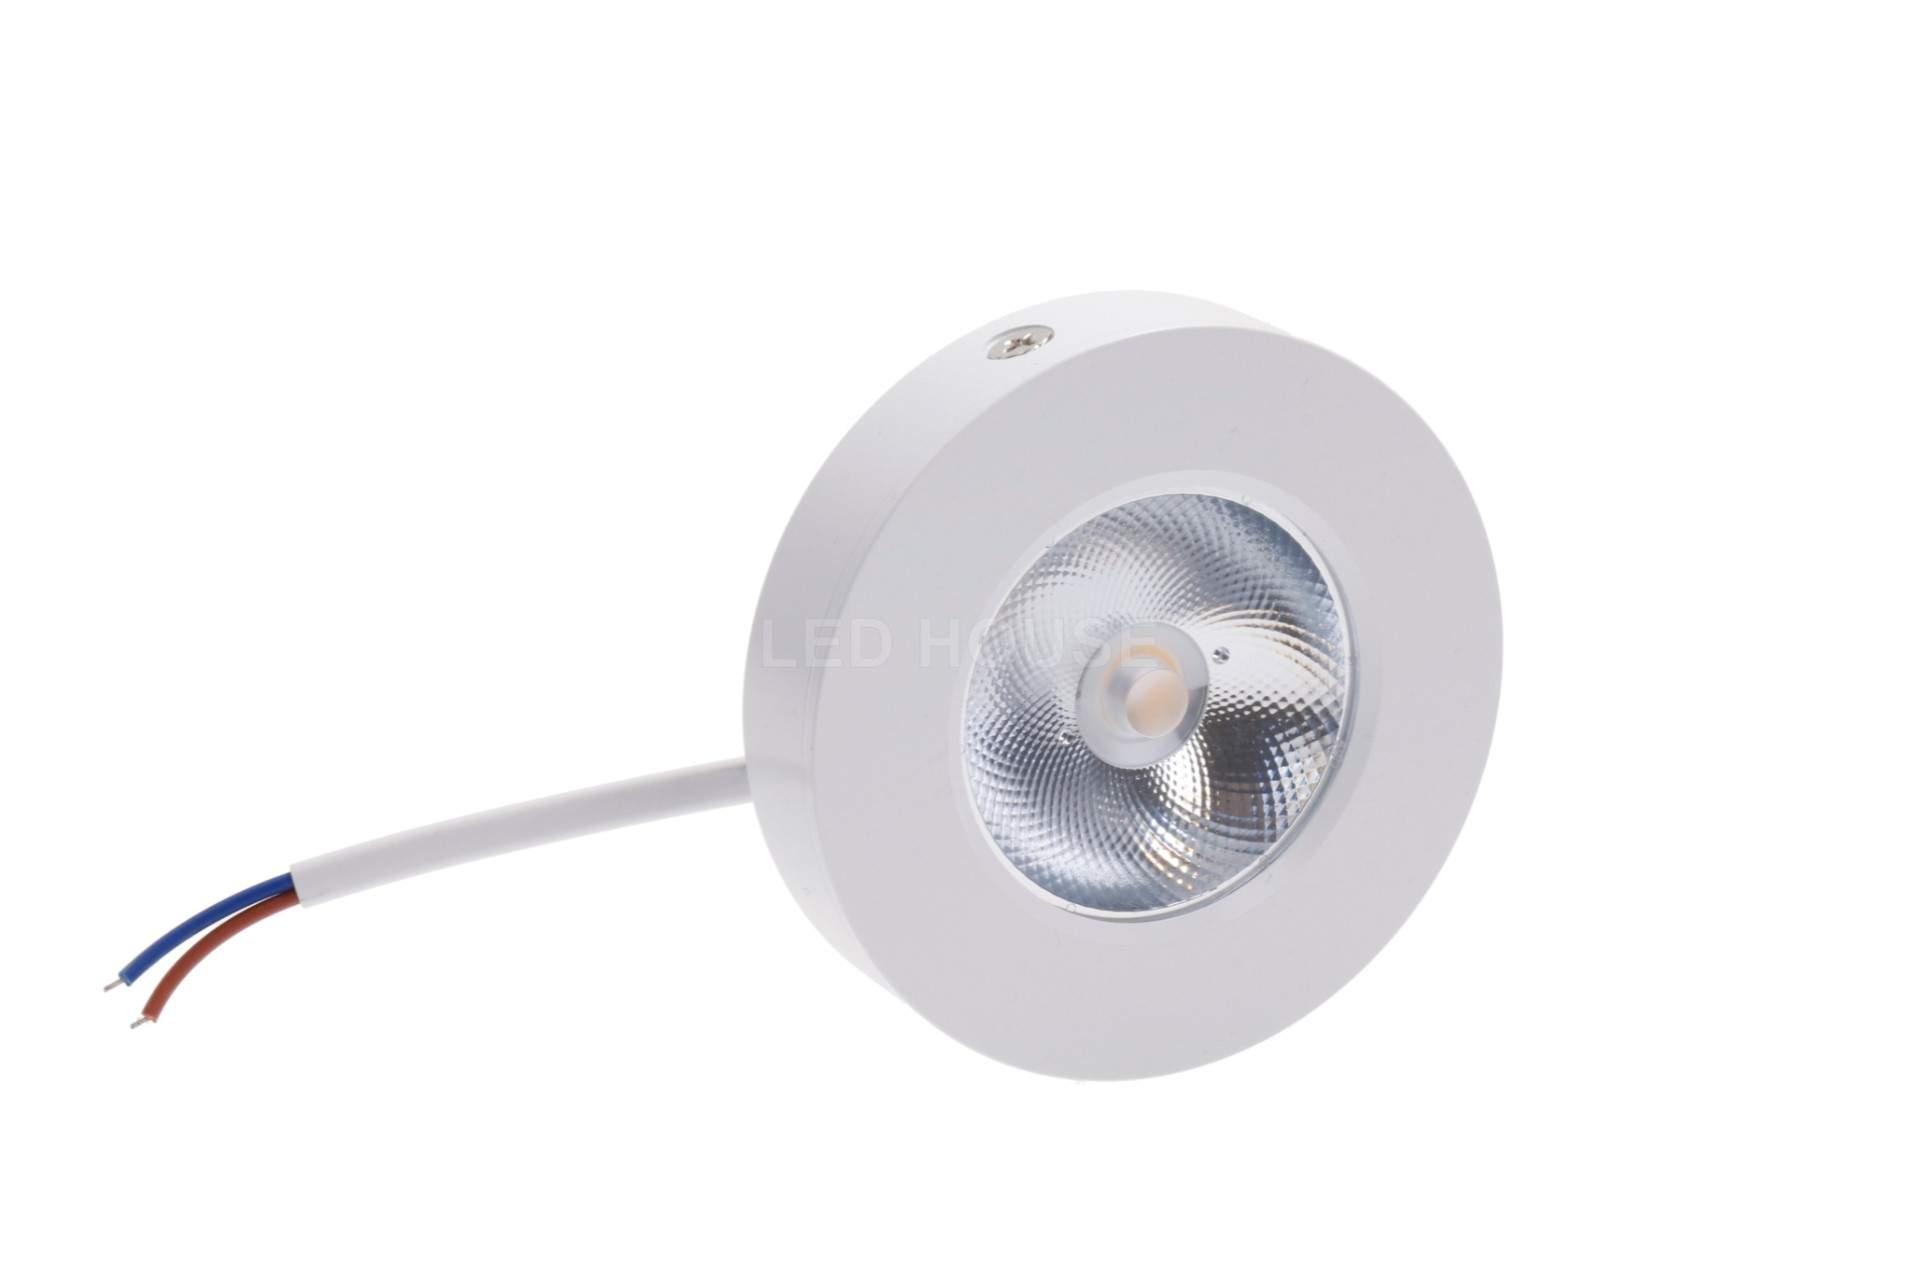 LED furniture light LED furniture light REVAL BULB FD DIM white round 5W 450lm CRI80  30° IP20 3000K warm white